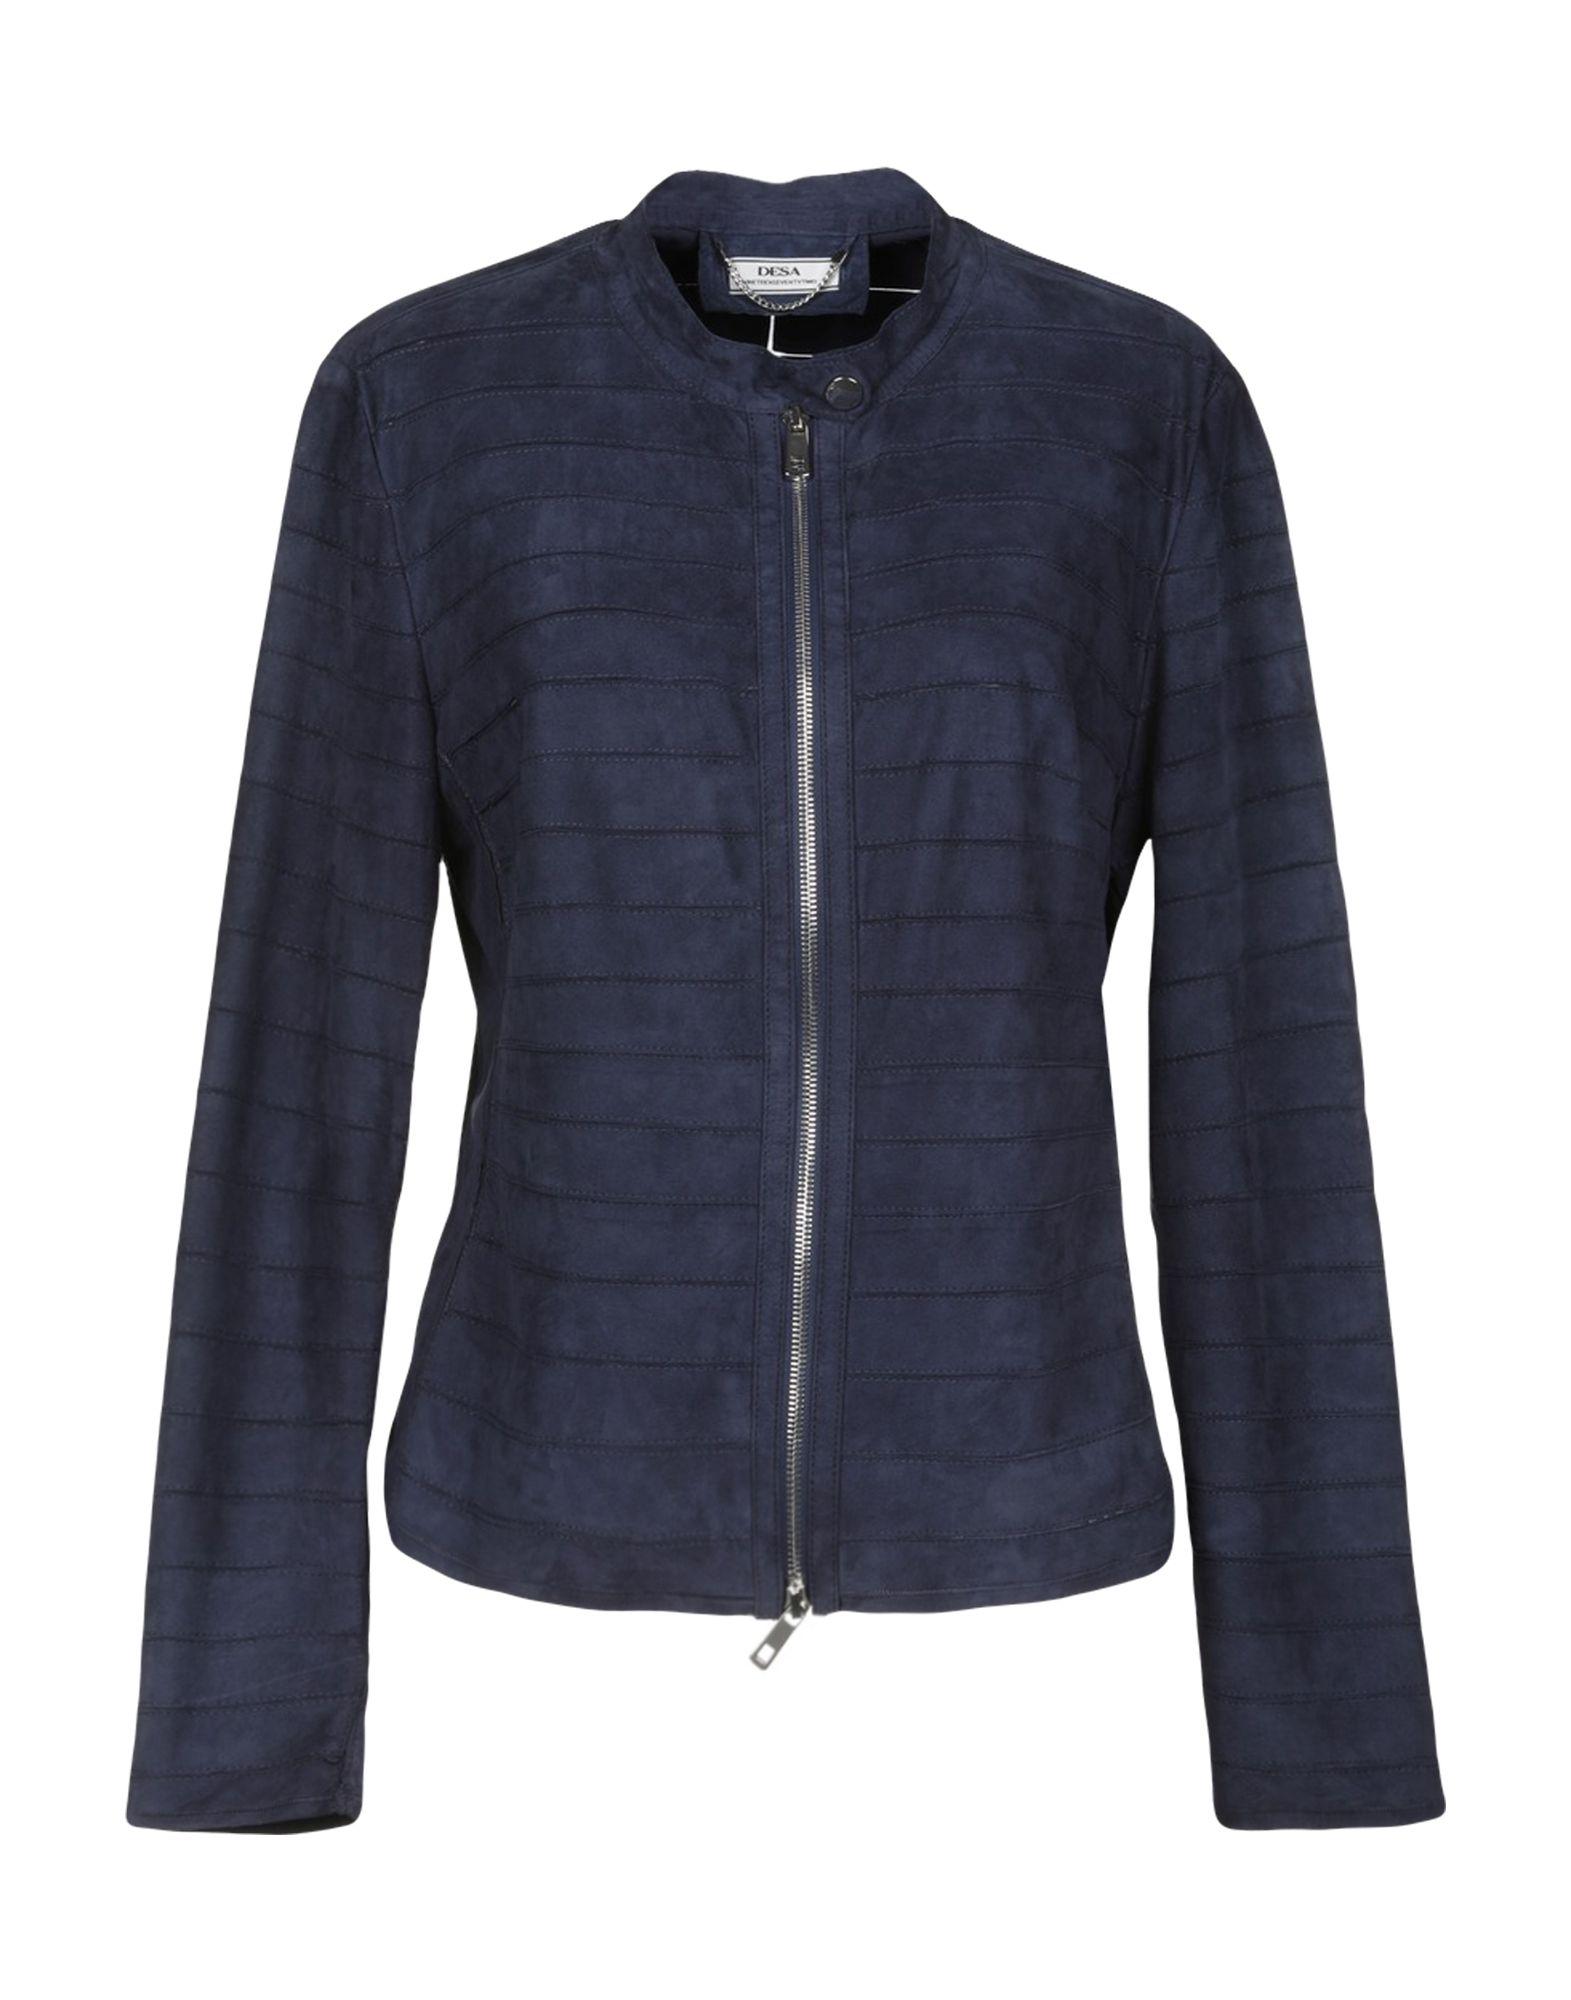 DESA NINETEENSEVENTYTWO Jackets in Dark Blue